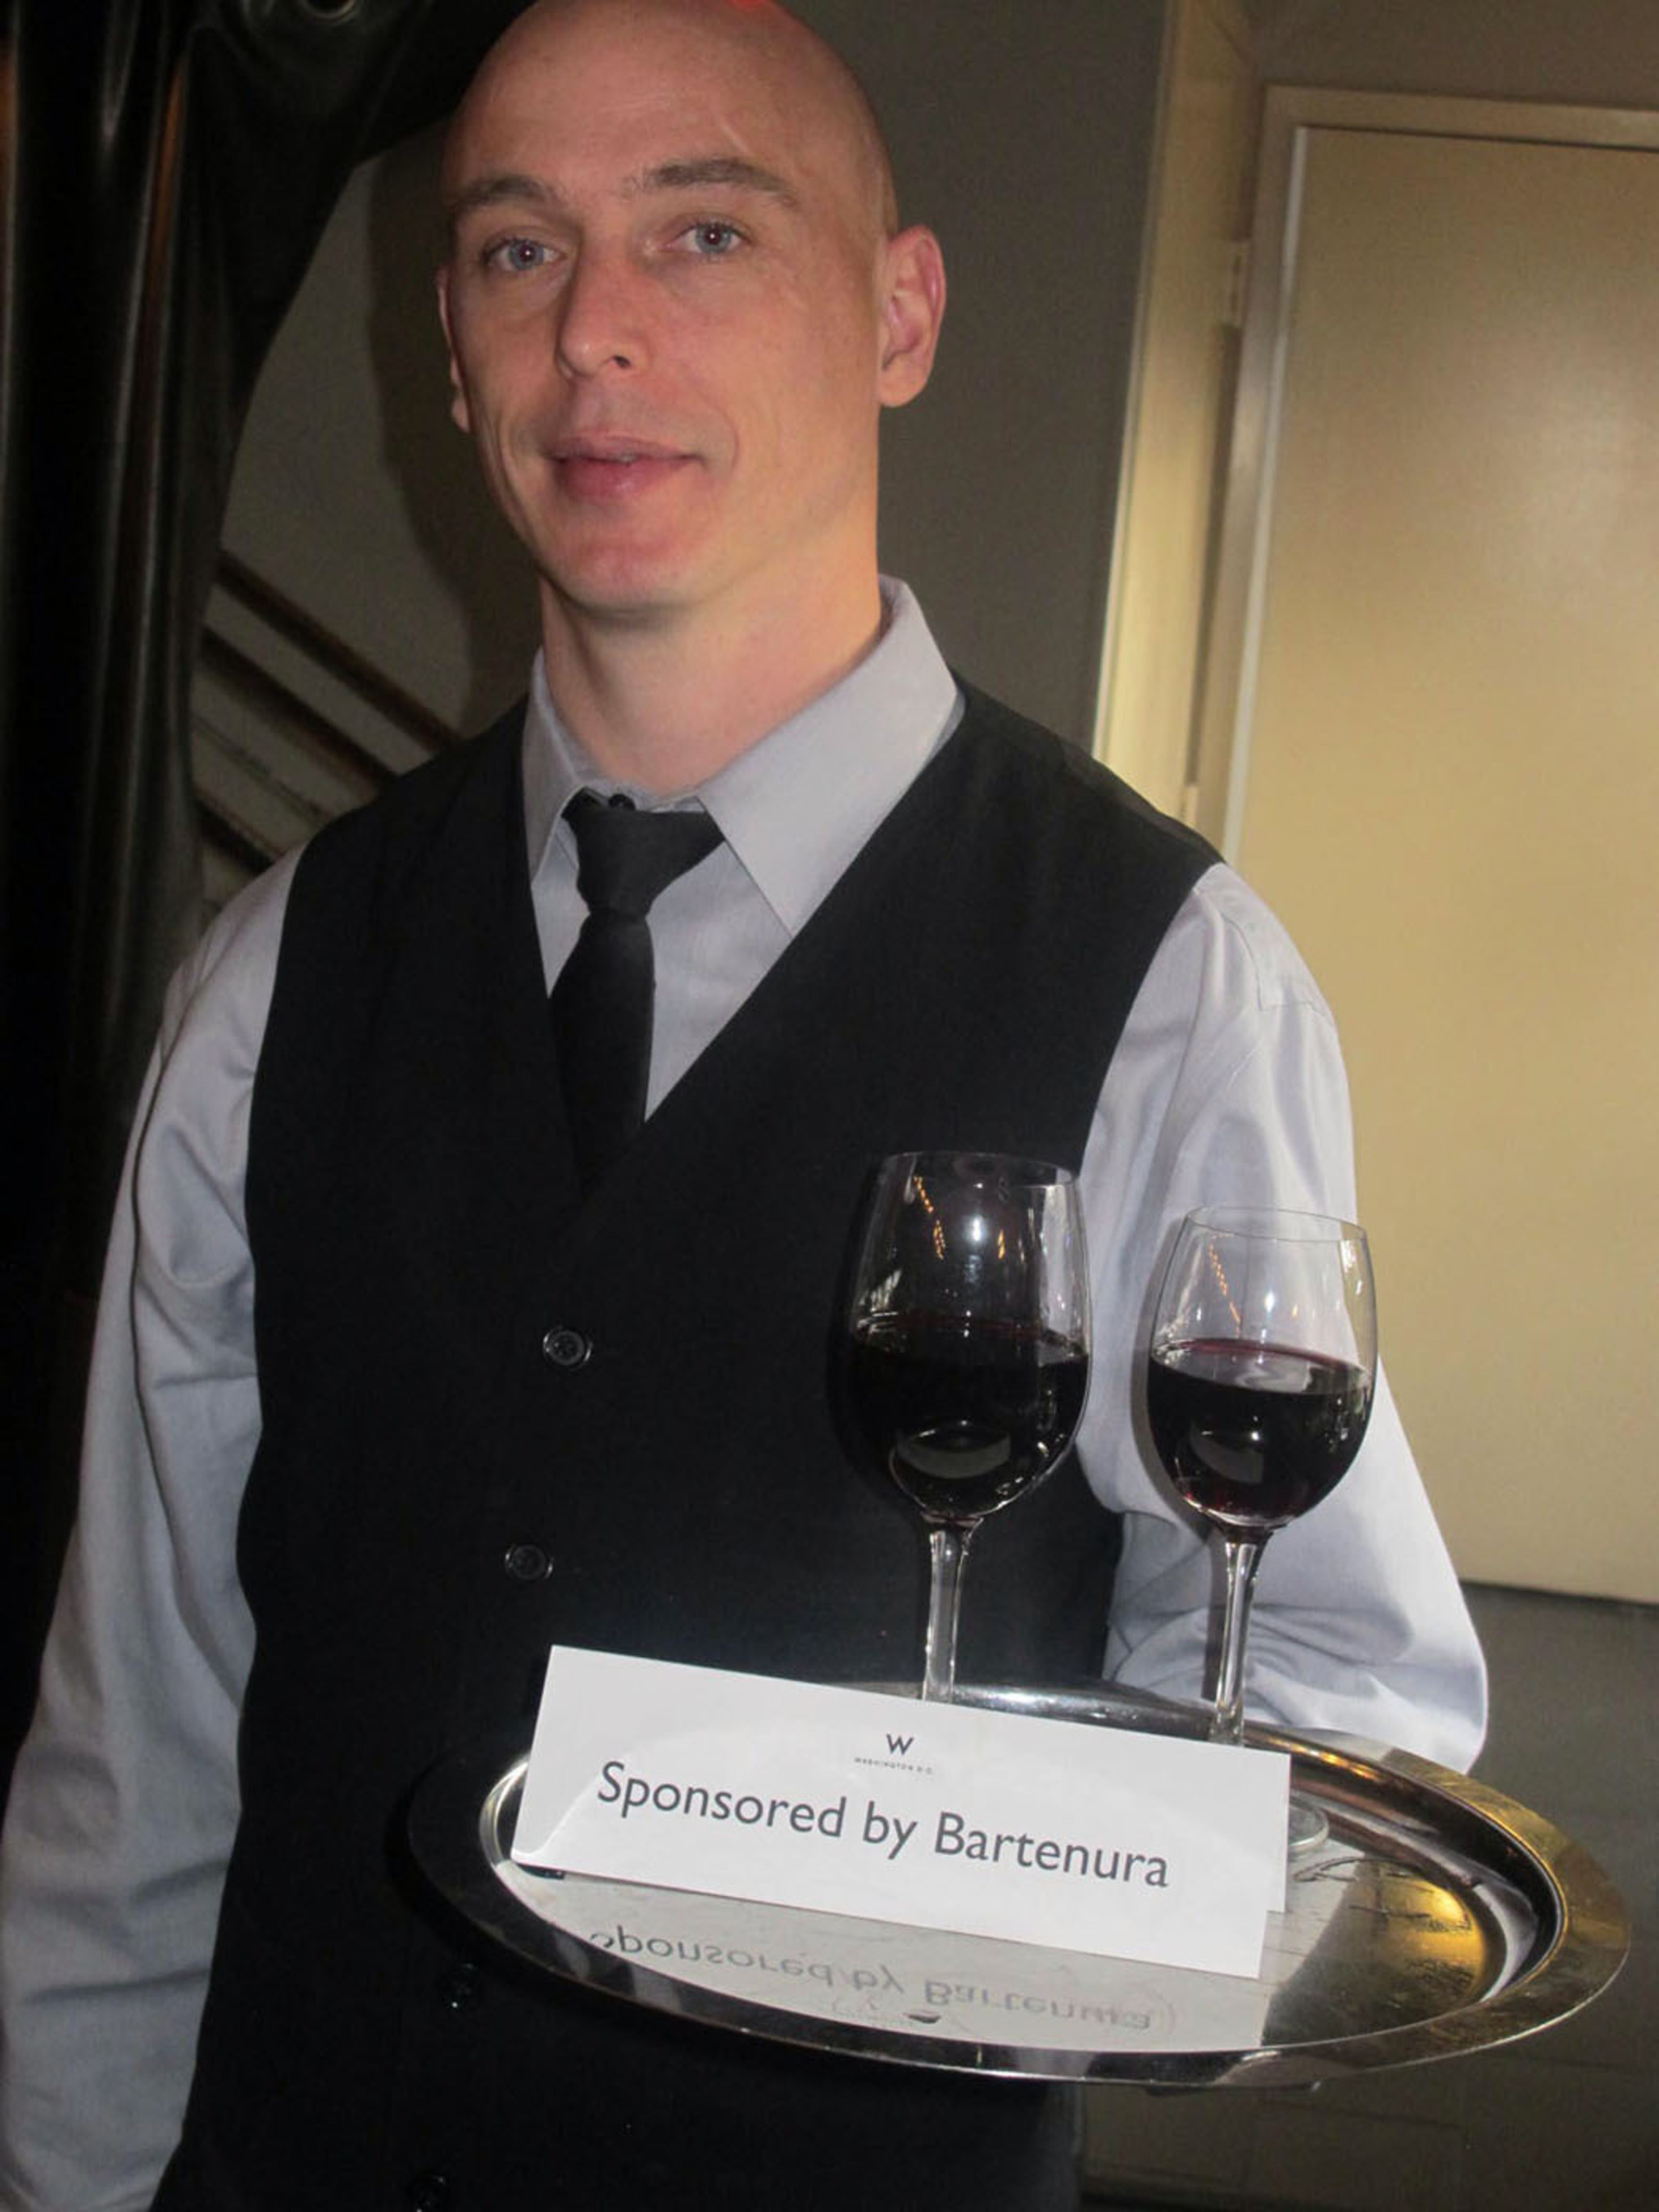 Bartenera waiter.  (PRNewsFoto/Bartenura Wines)